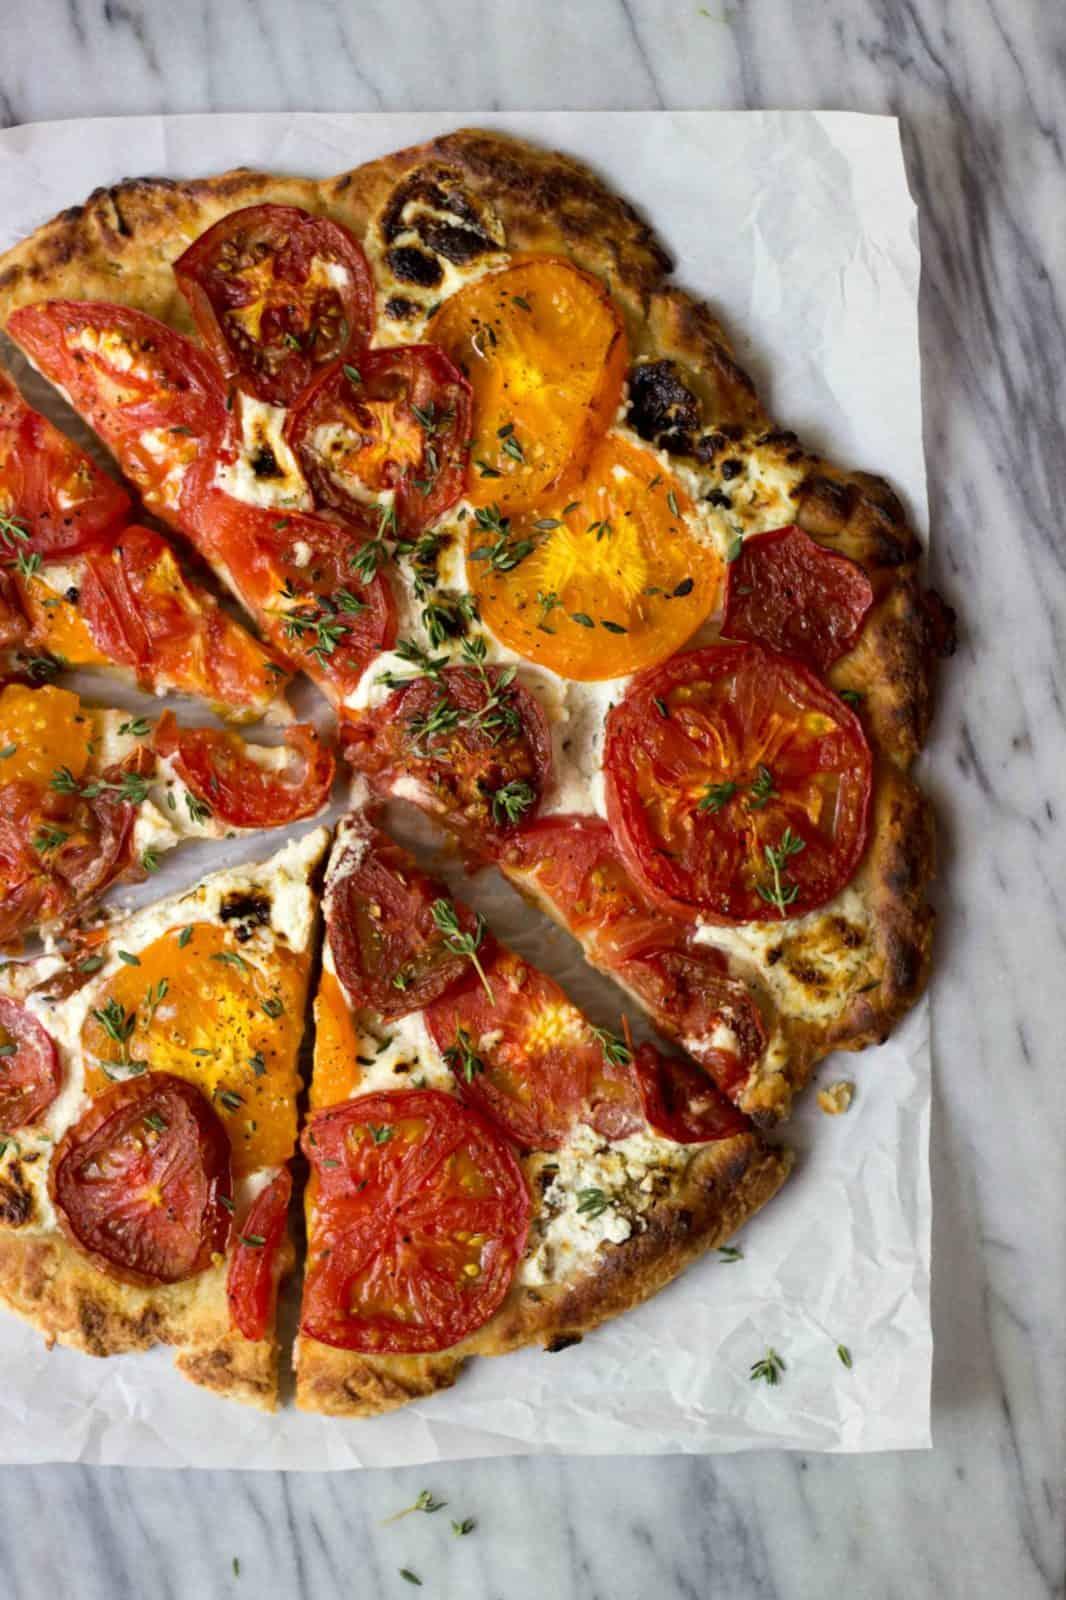 Vegetarian Rustic Heirloom Tomato Pizza on marble board.